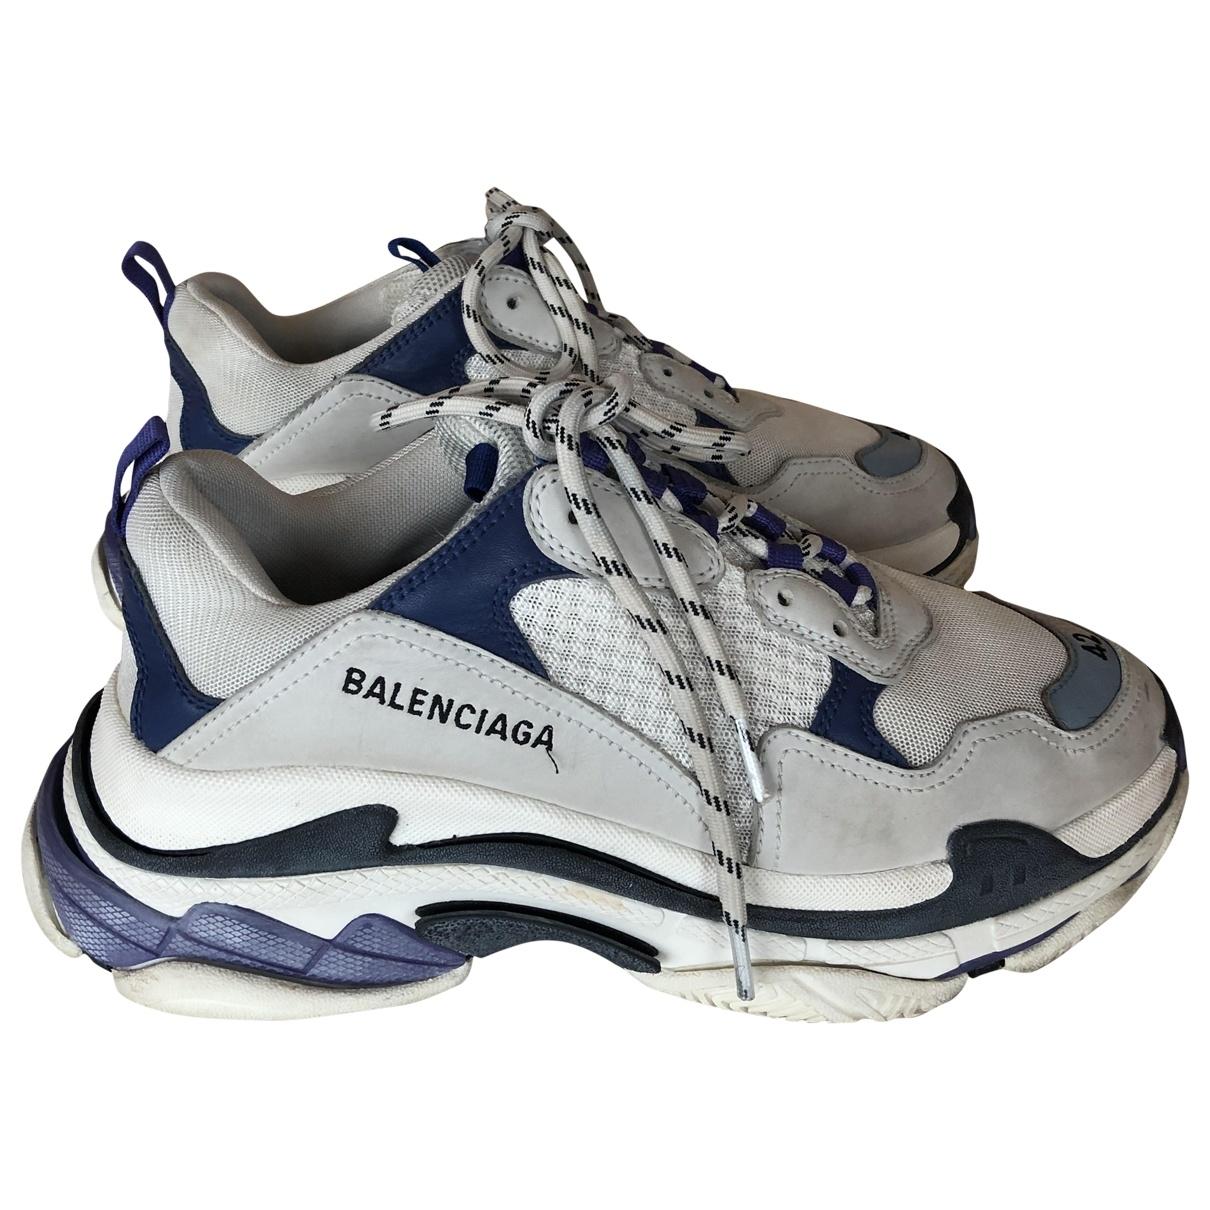 Balenciaga - Baskets Triple S pour homme en cuir - bleu